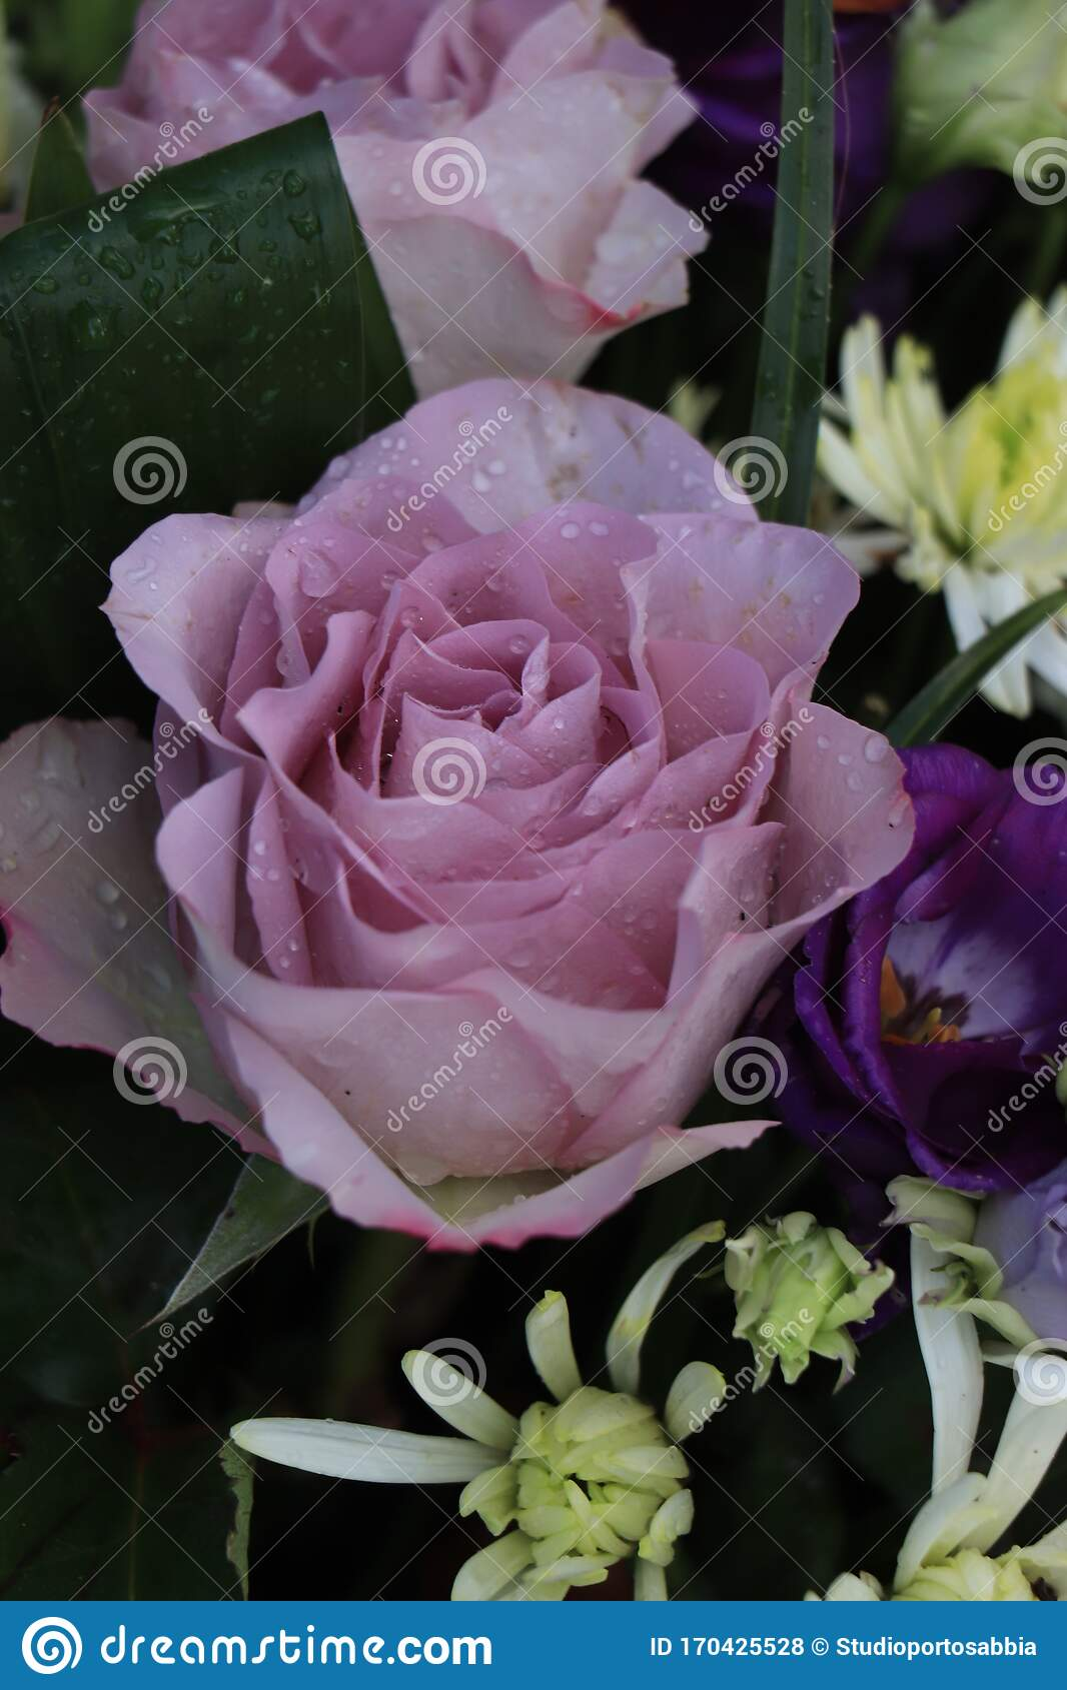 Purple Flower Arrangement For A Wedding Stock Photo Image Of Summer Spring 170425528